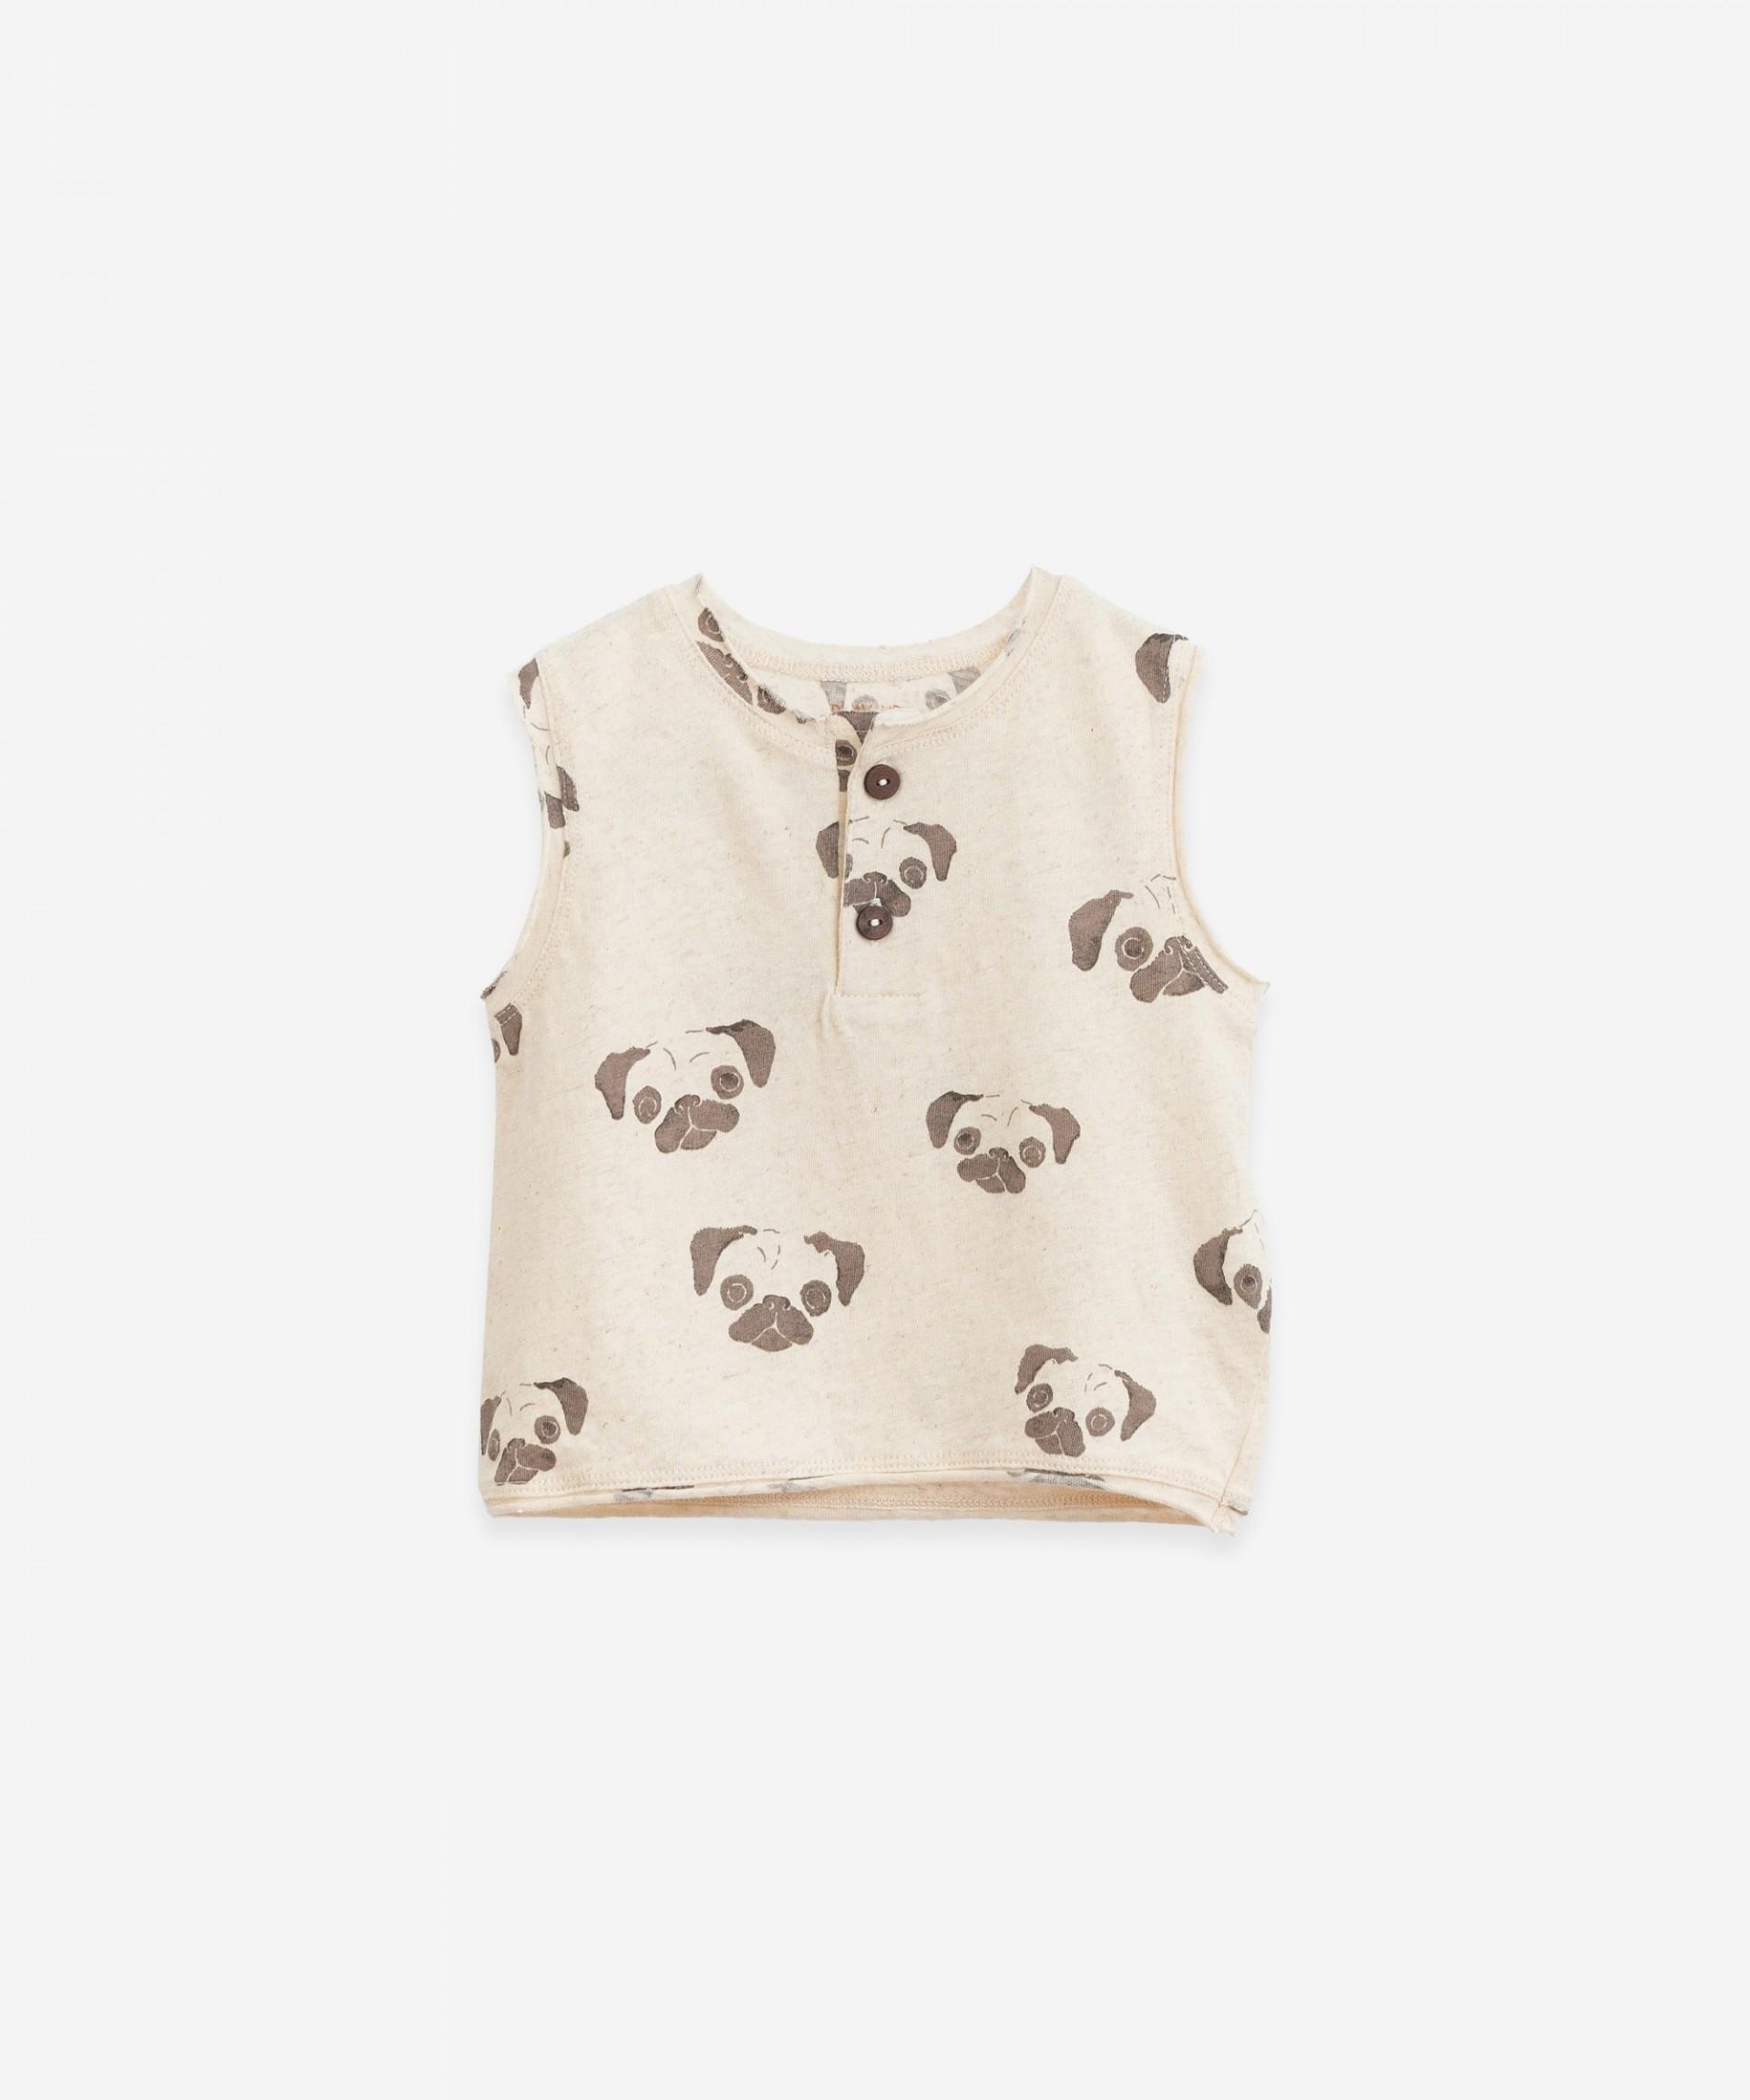 T-Shirt senza maniche con apertura | Botany